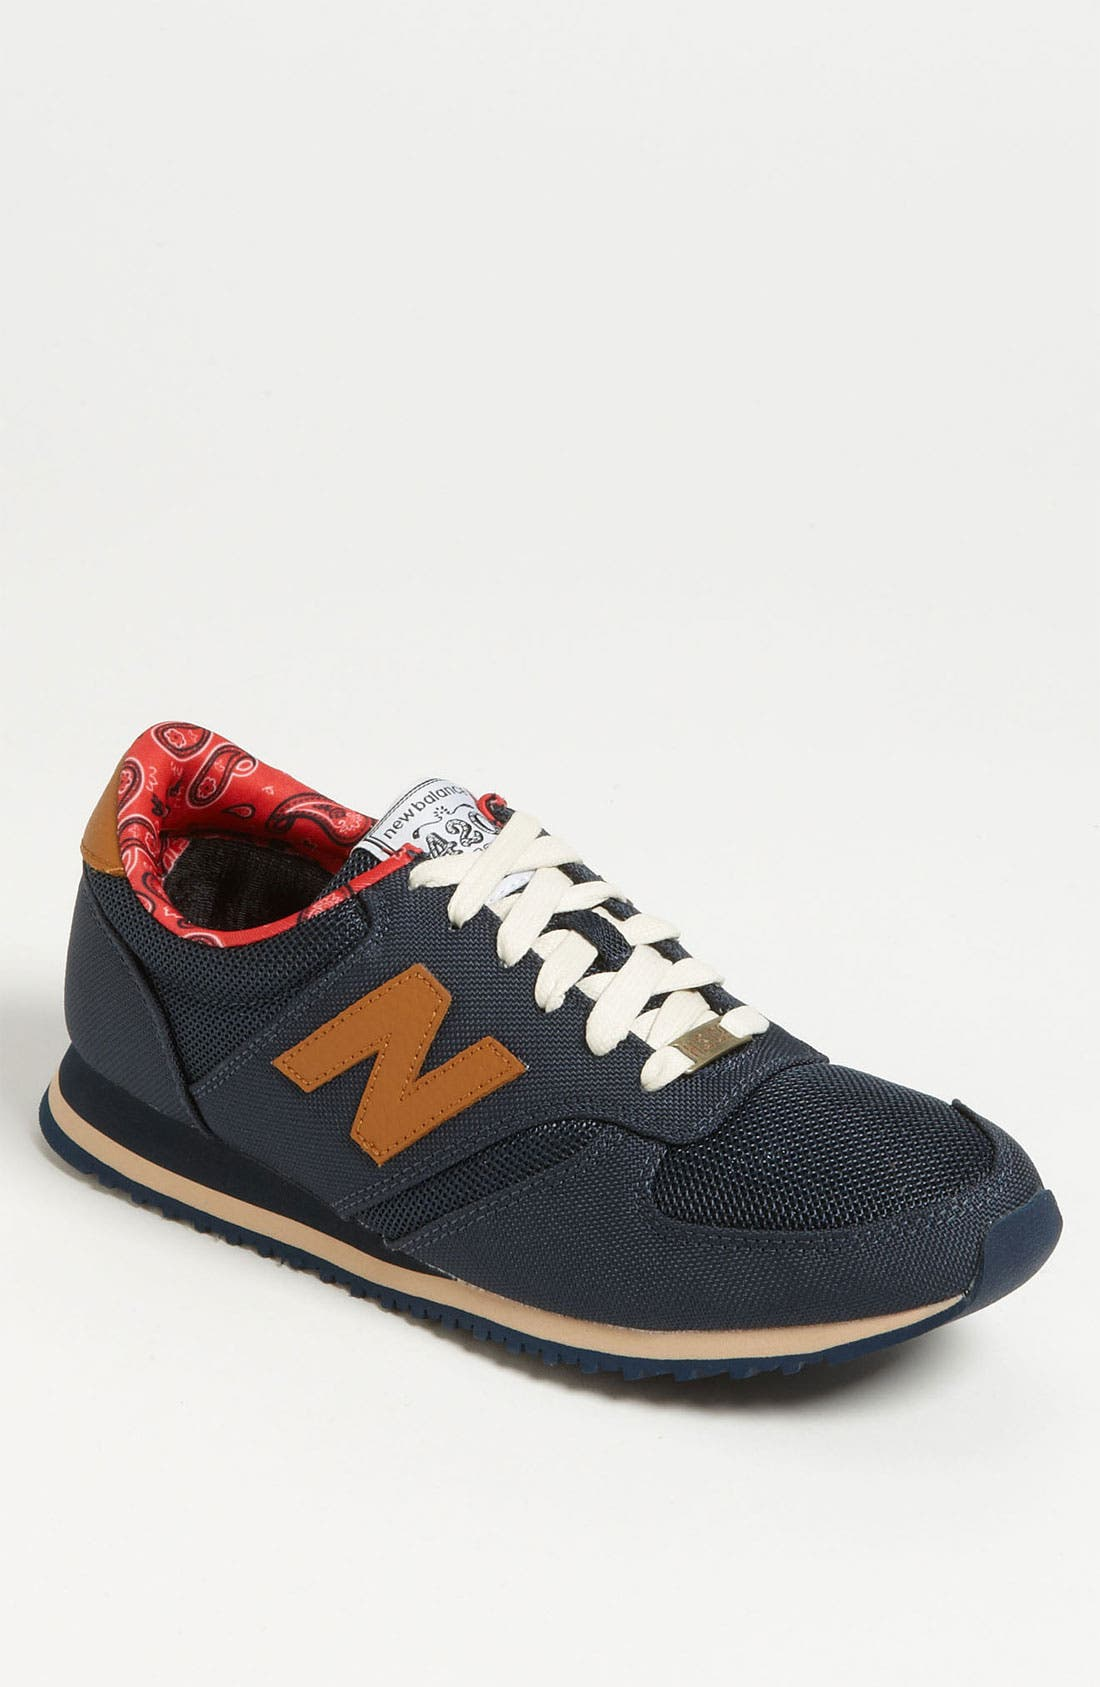 Alternate Image 1 Selected - New Balance 'Herschel Supply Co. - 420' Sneaker (Men)